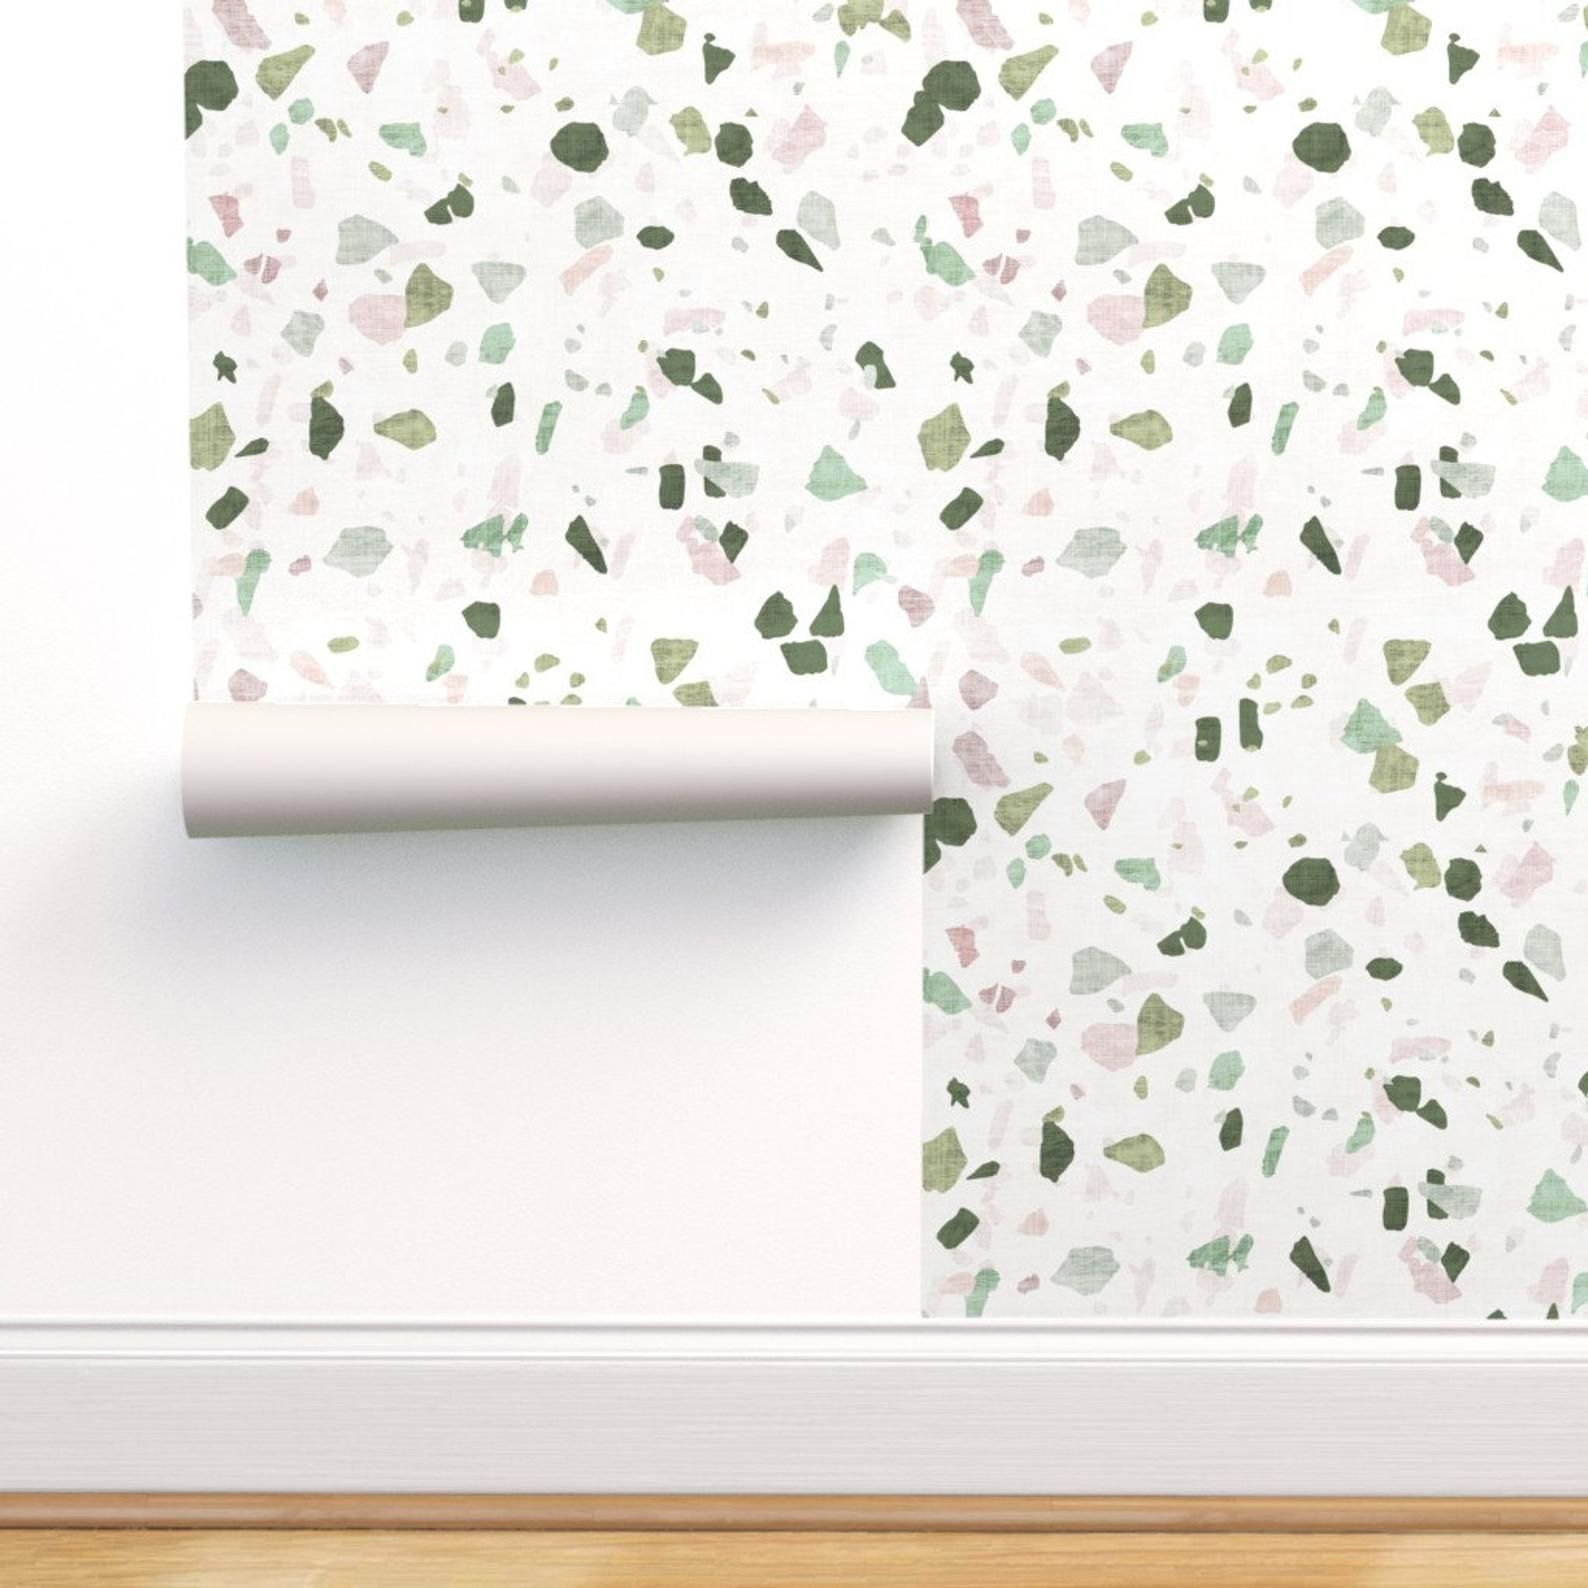 Terrazzo Wallpaper Petra Terrazzo By Holli Zollinger Green Terrazzo Custom Printed Removable Self Adhesive Wallpaper Roll By Spoonflower Stick On Wallpaper Peel And Stick Wallpaper Removable Wallpaper